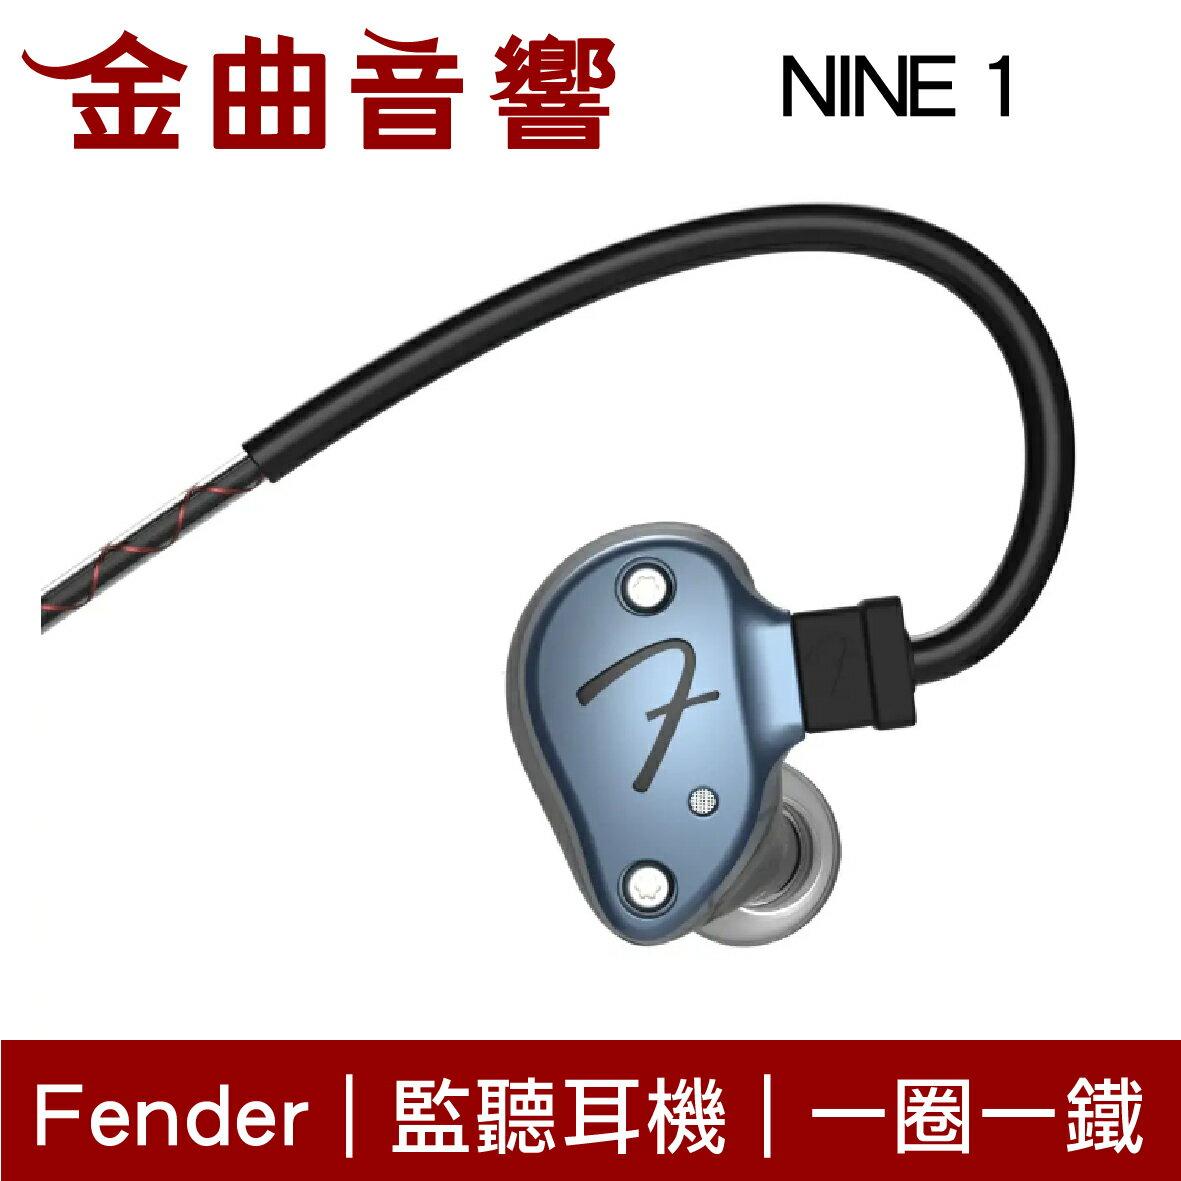 Fender Nine 1 藍色 Pro IEM 監聽耳機 Nine1 金曲音響